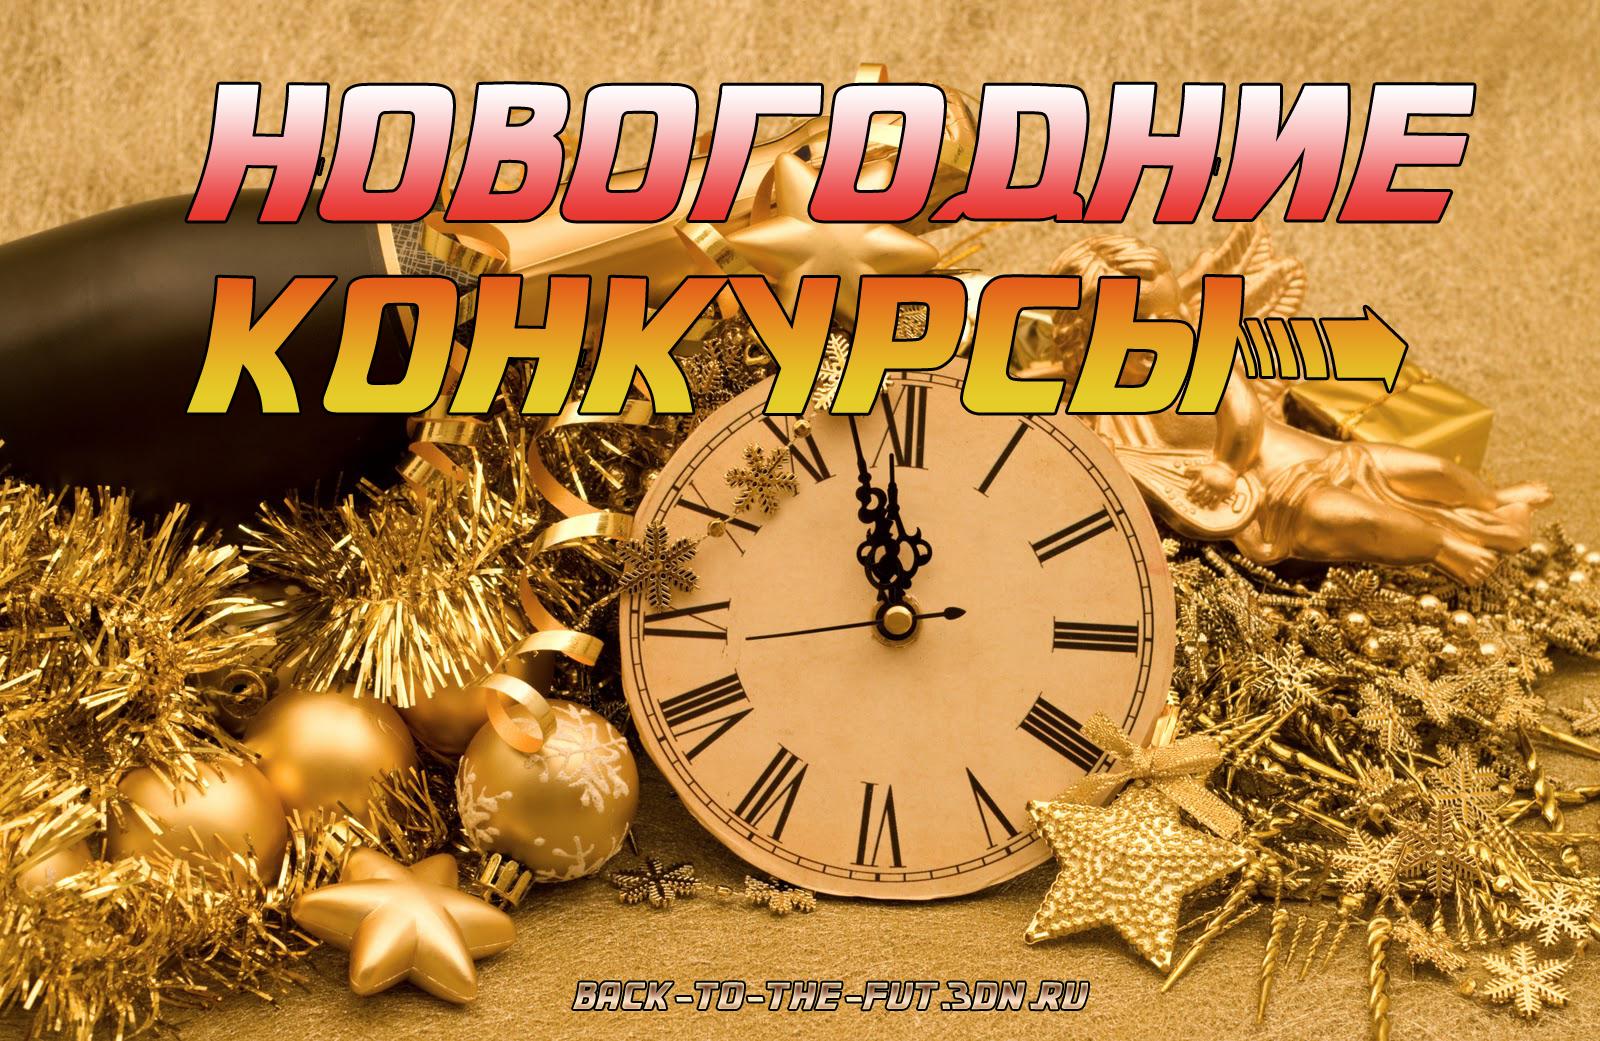 Скачать бесплатные приколы мобильный ...: anekdotov-inet.ru/papka/4373-skachat-besplatnie-prikoli-mobilniy.html